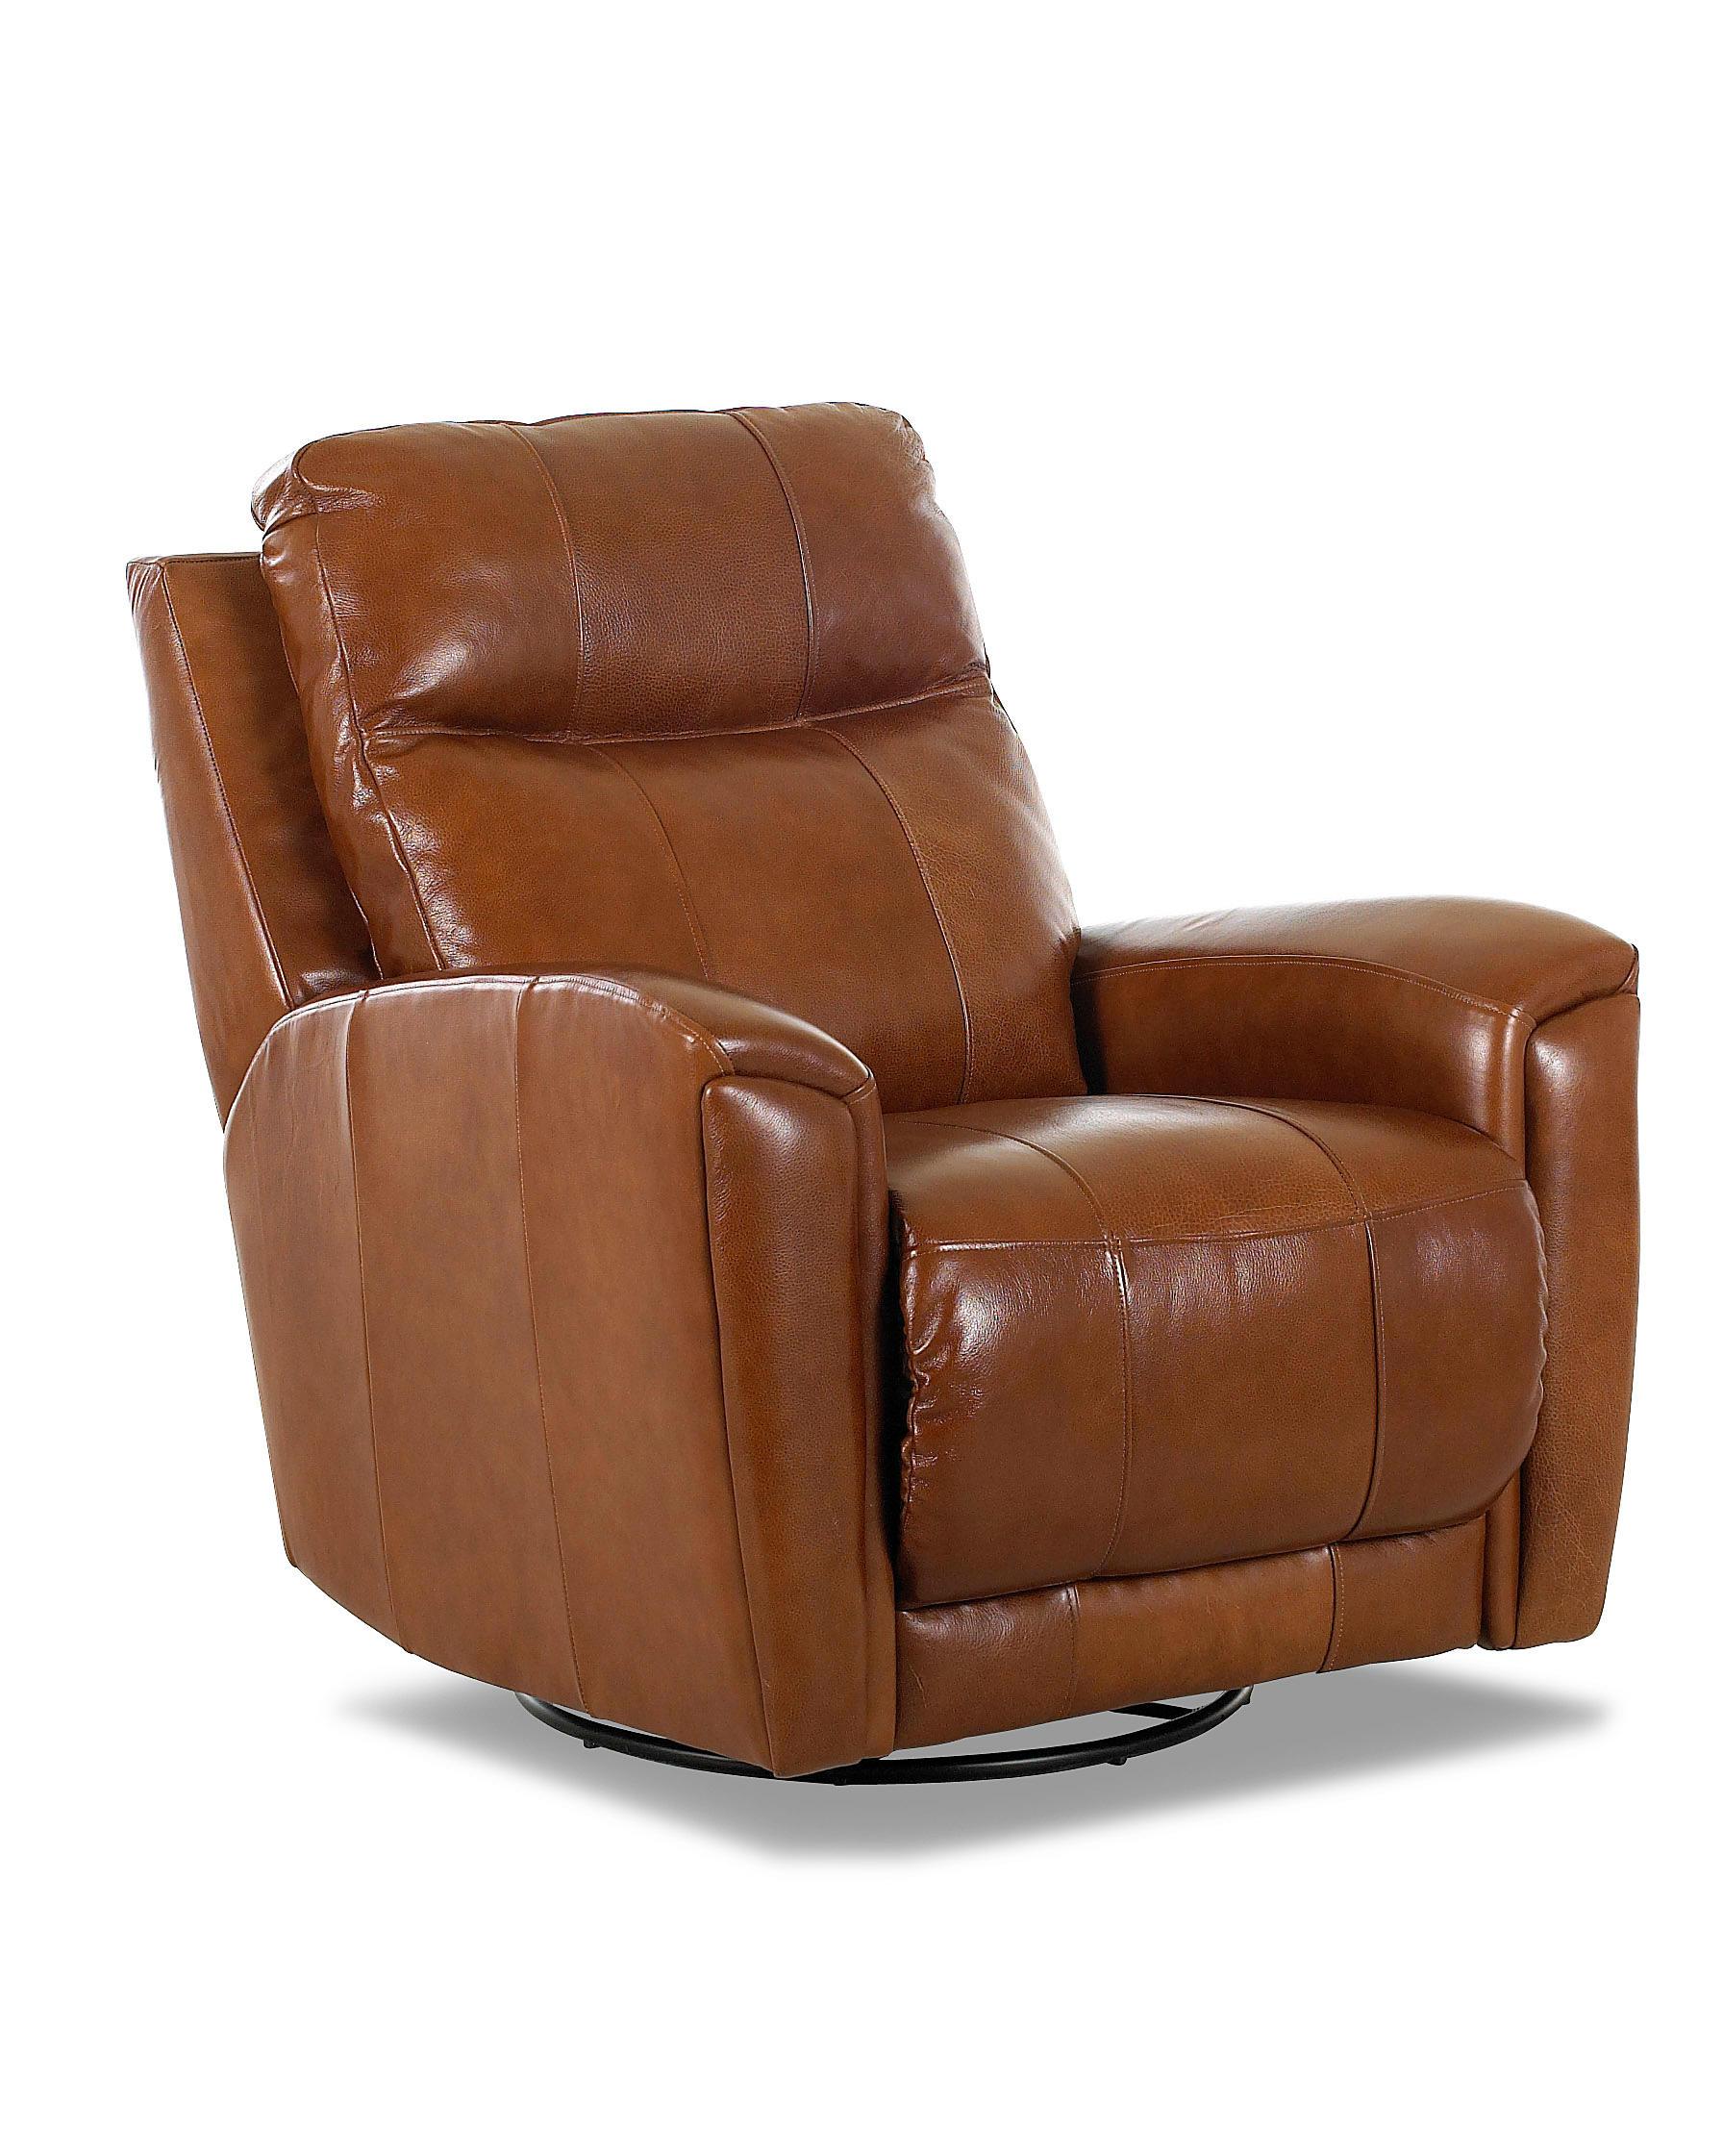 Bejnar's Fine Furniture, Shelby Township Michigan (MI